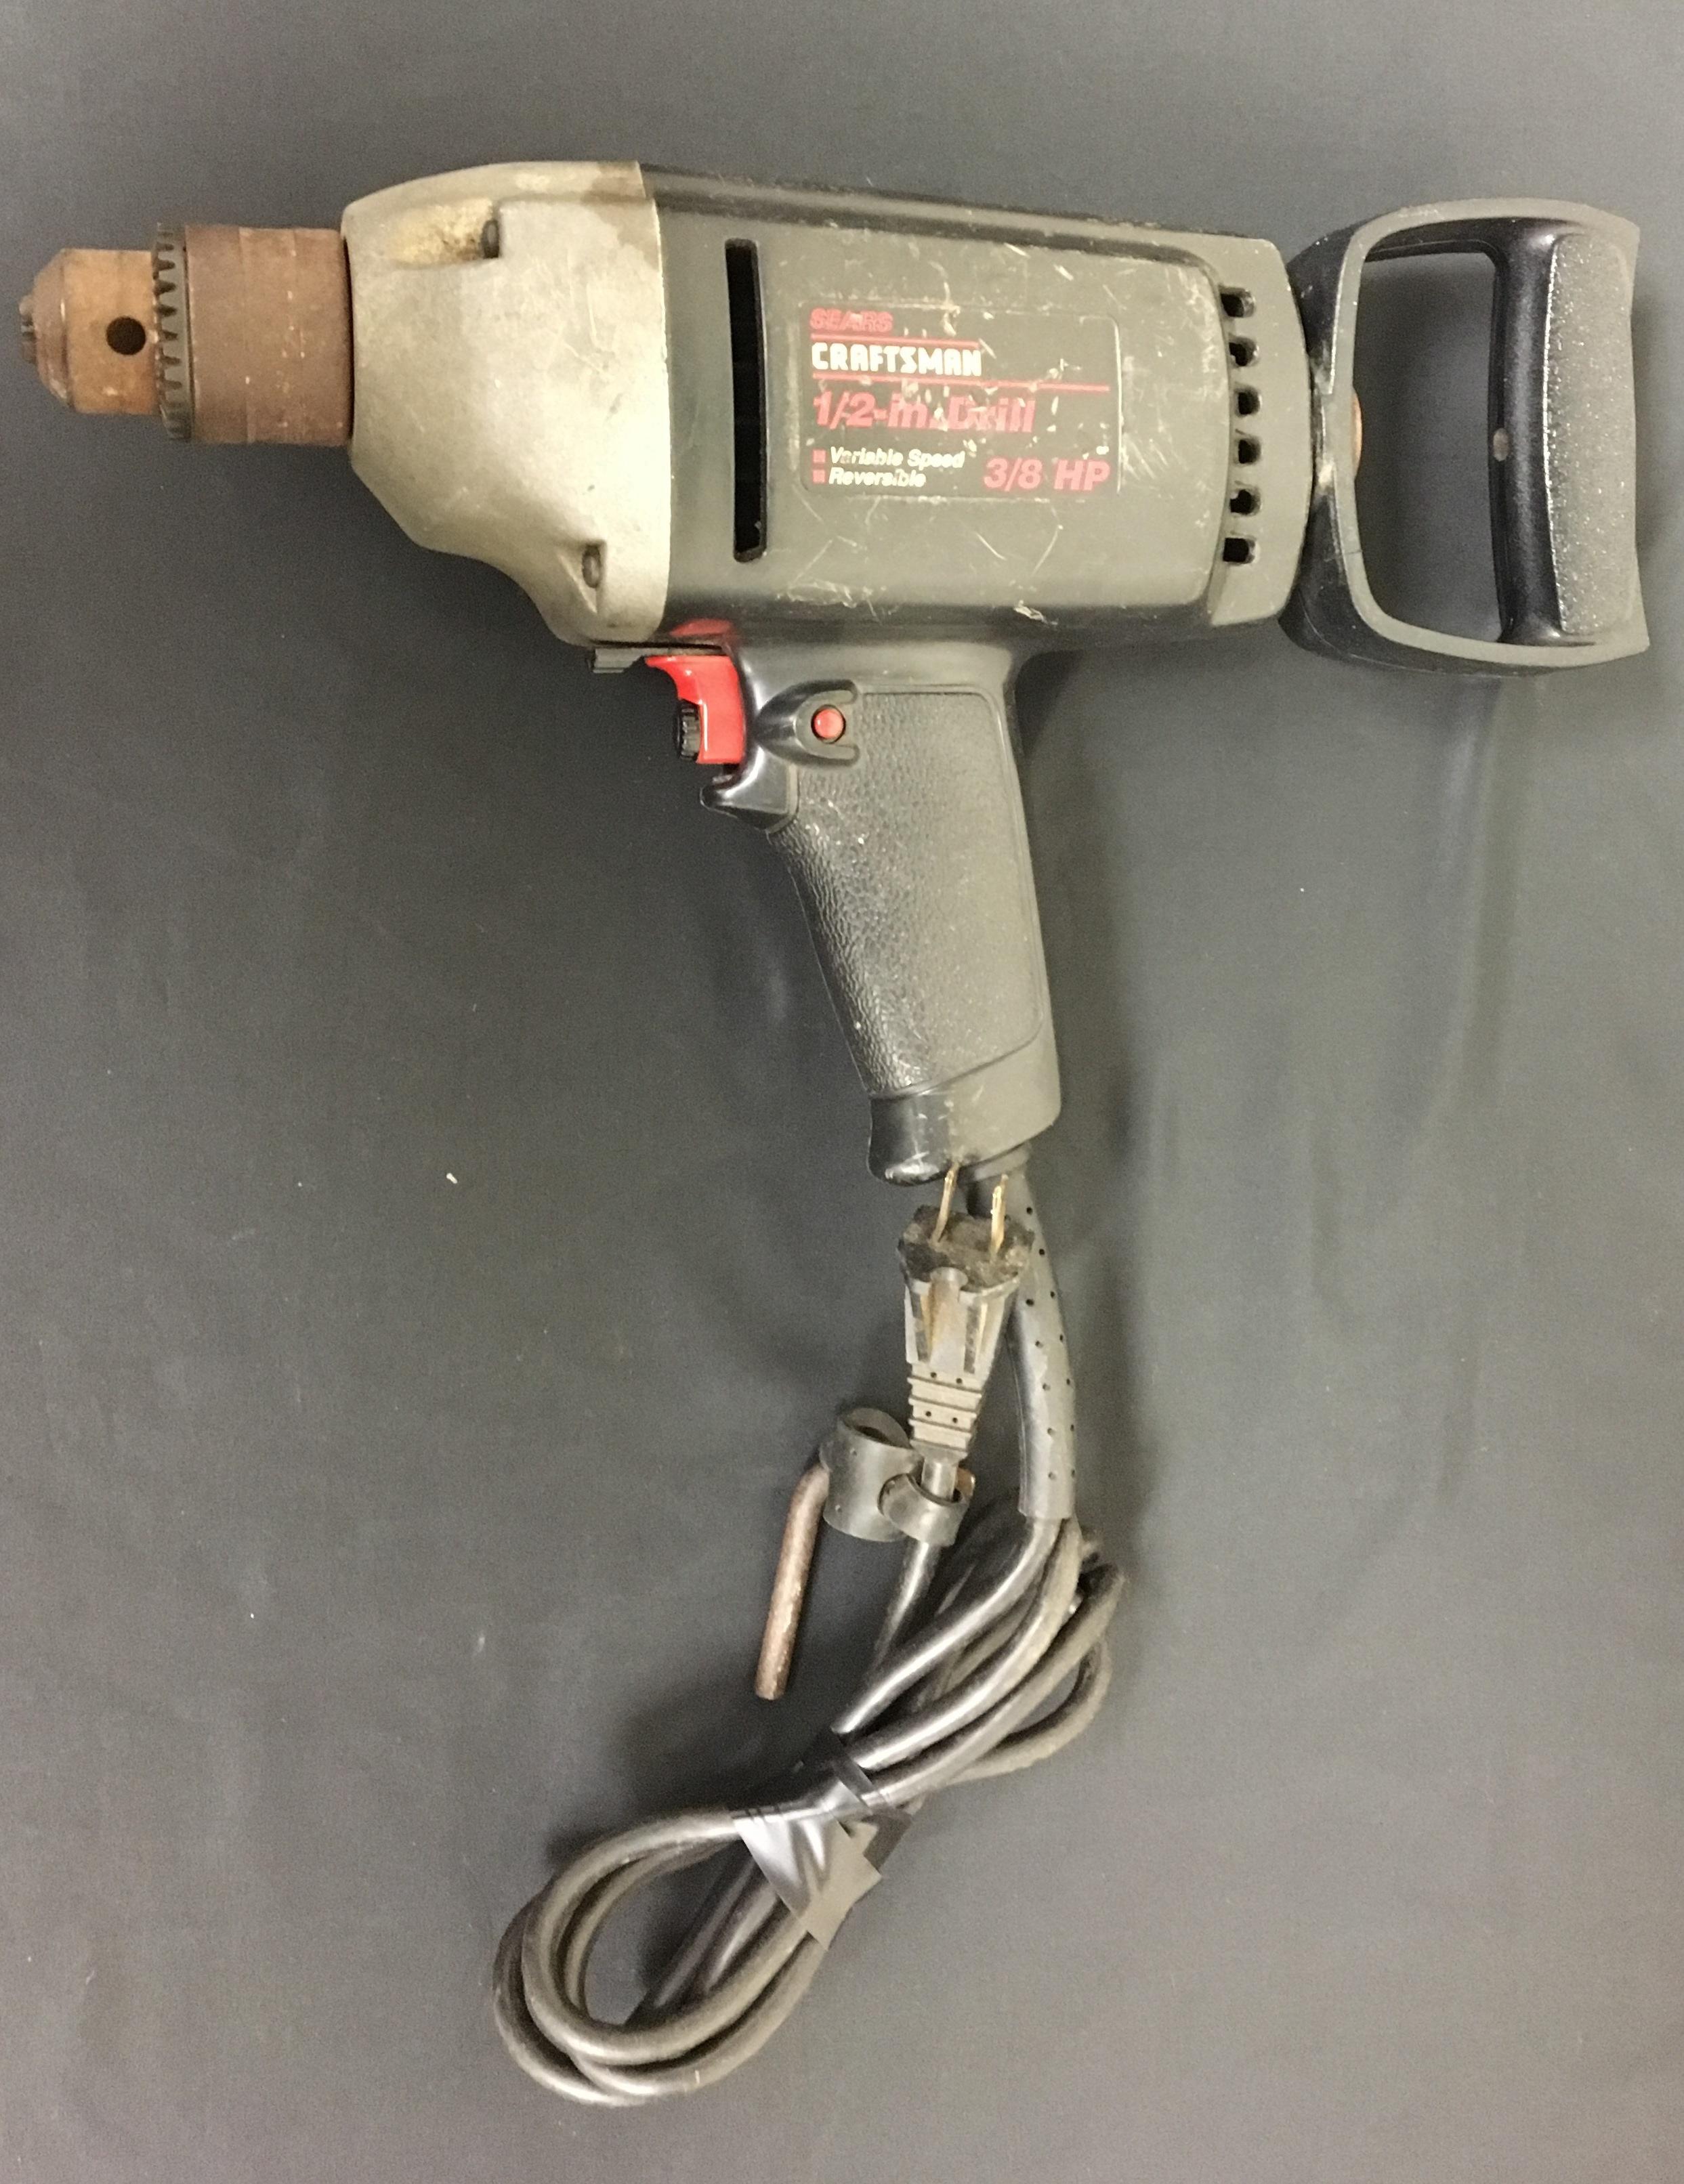 CRAFTSMAN - 315.10281 - HAMMER DRILL 3/8 HP W/HANDLE